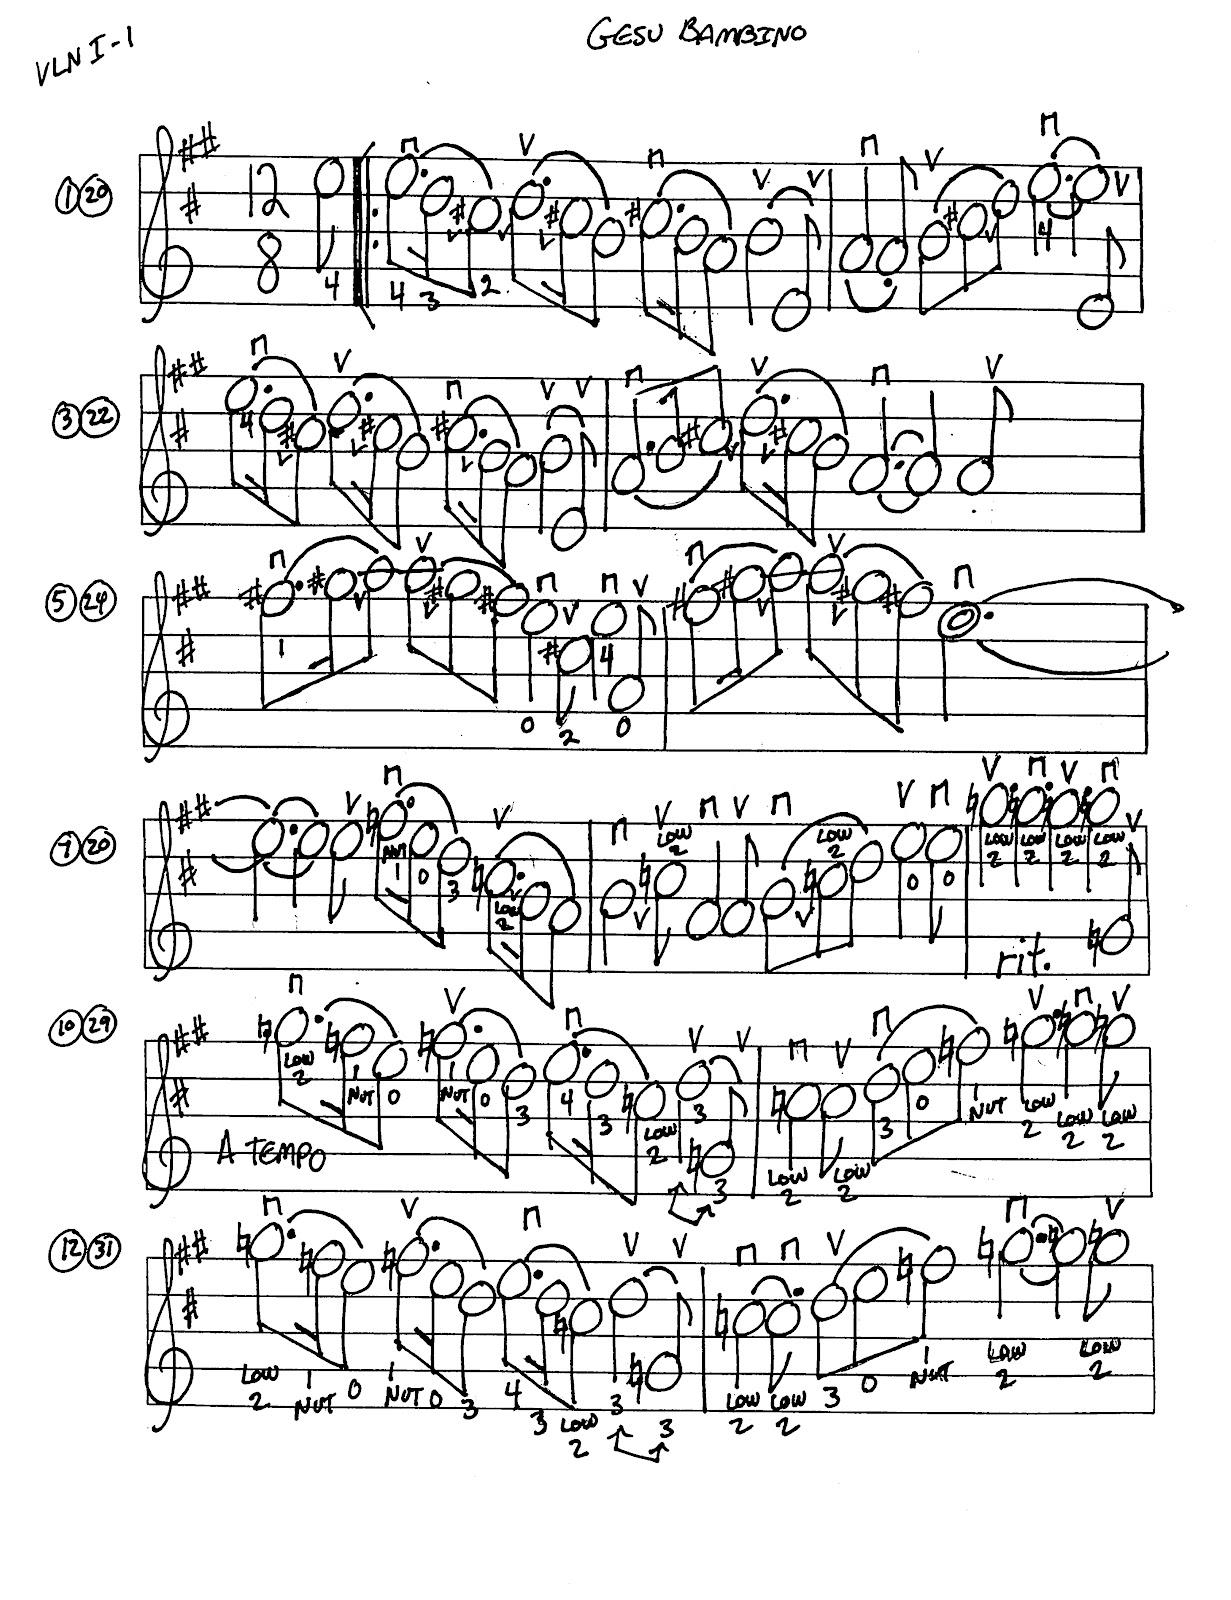 Miss Jacobson's Music: GESU BAMBINO MUSIC WORKSHEETS